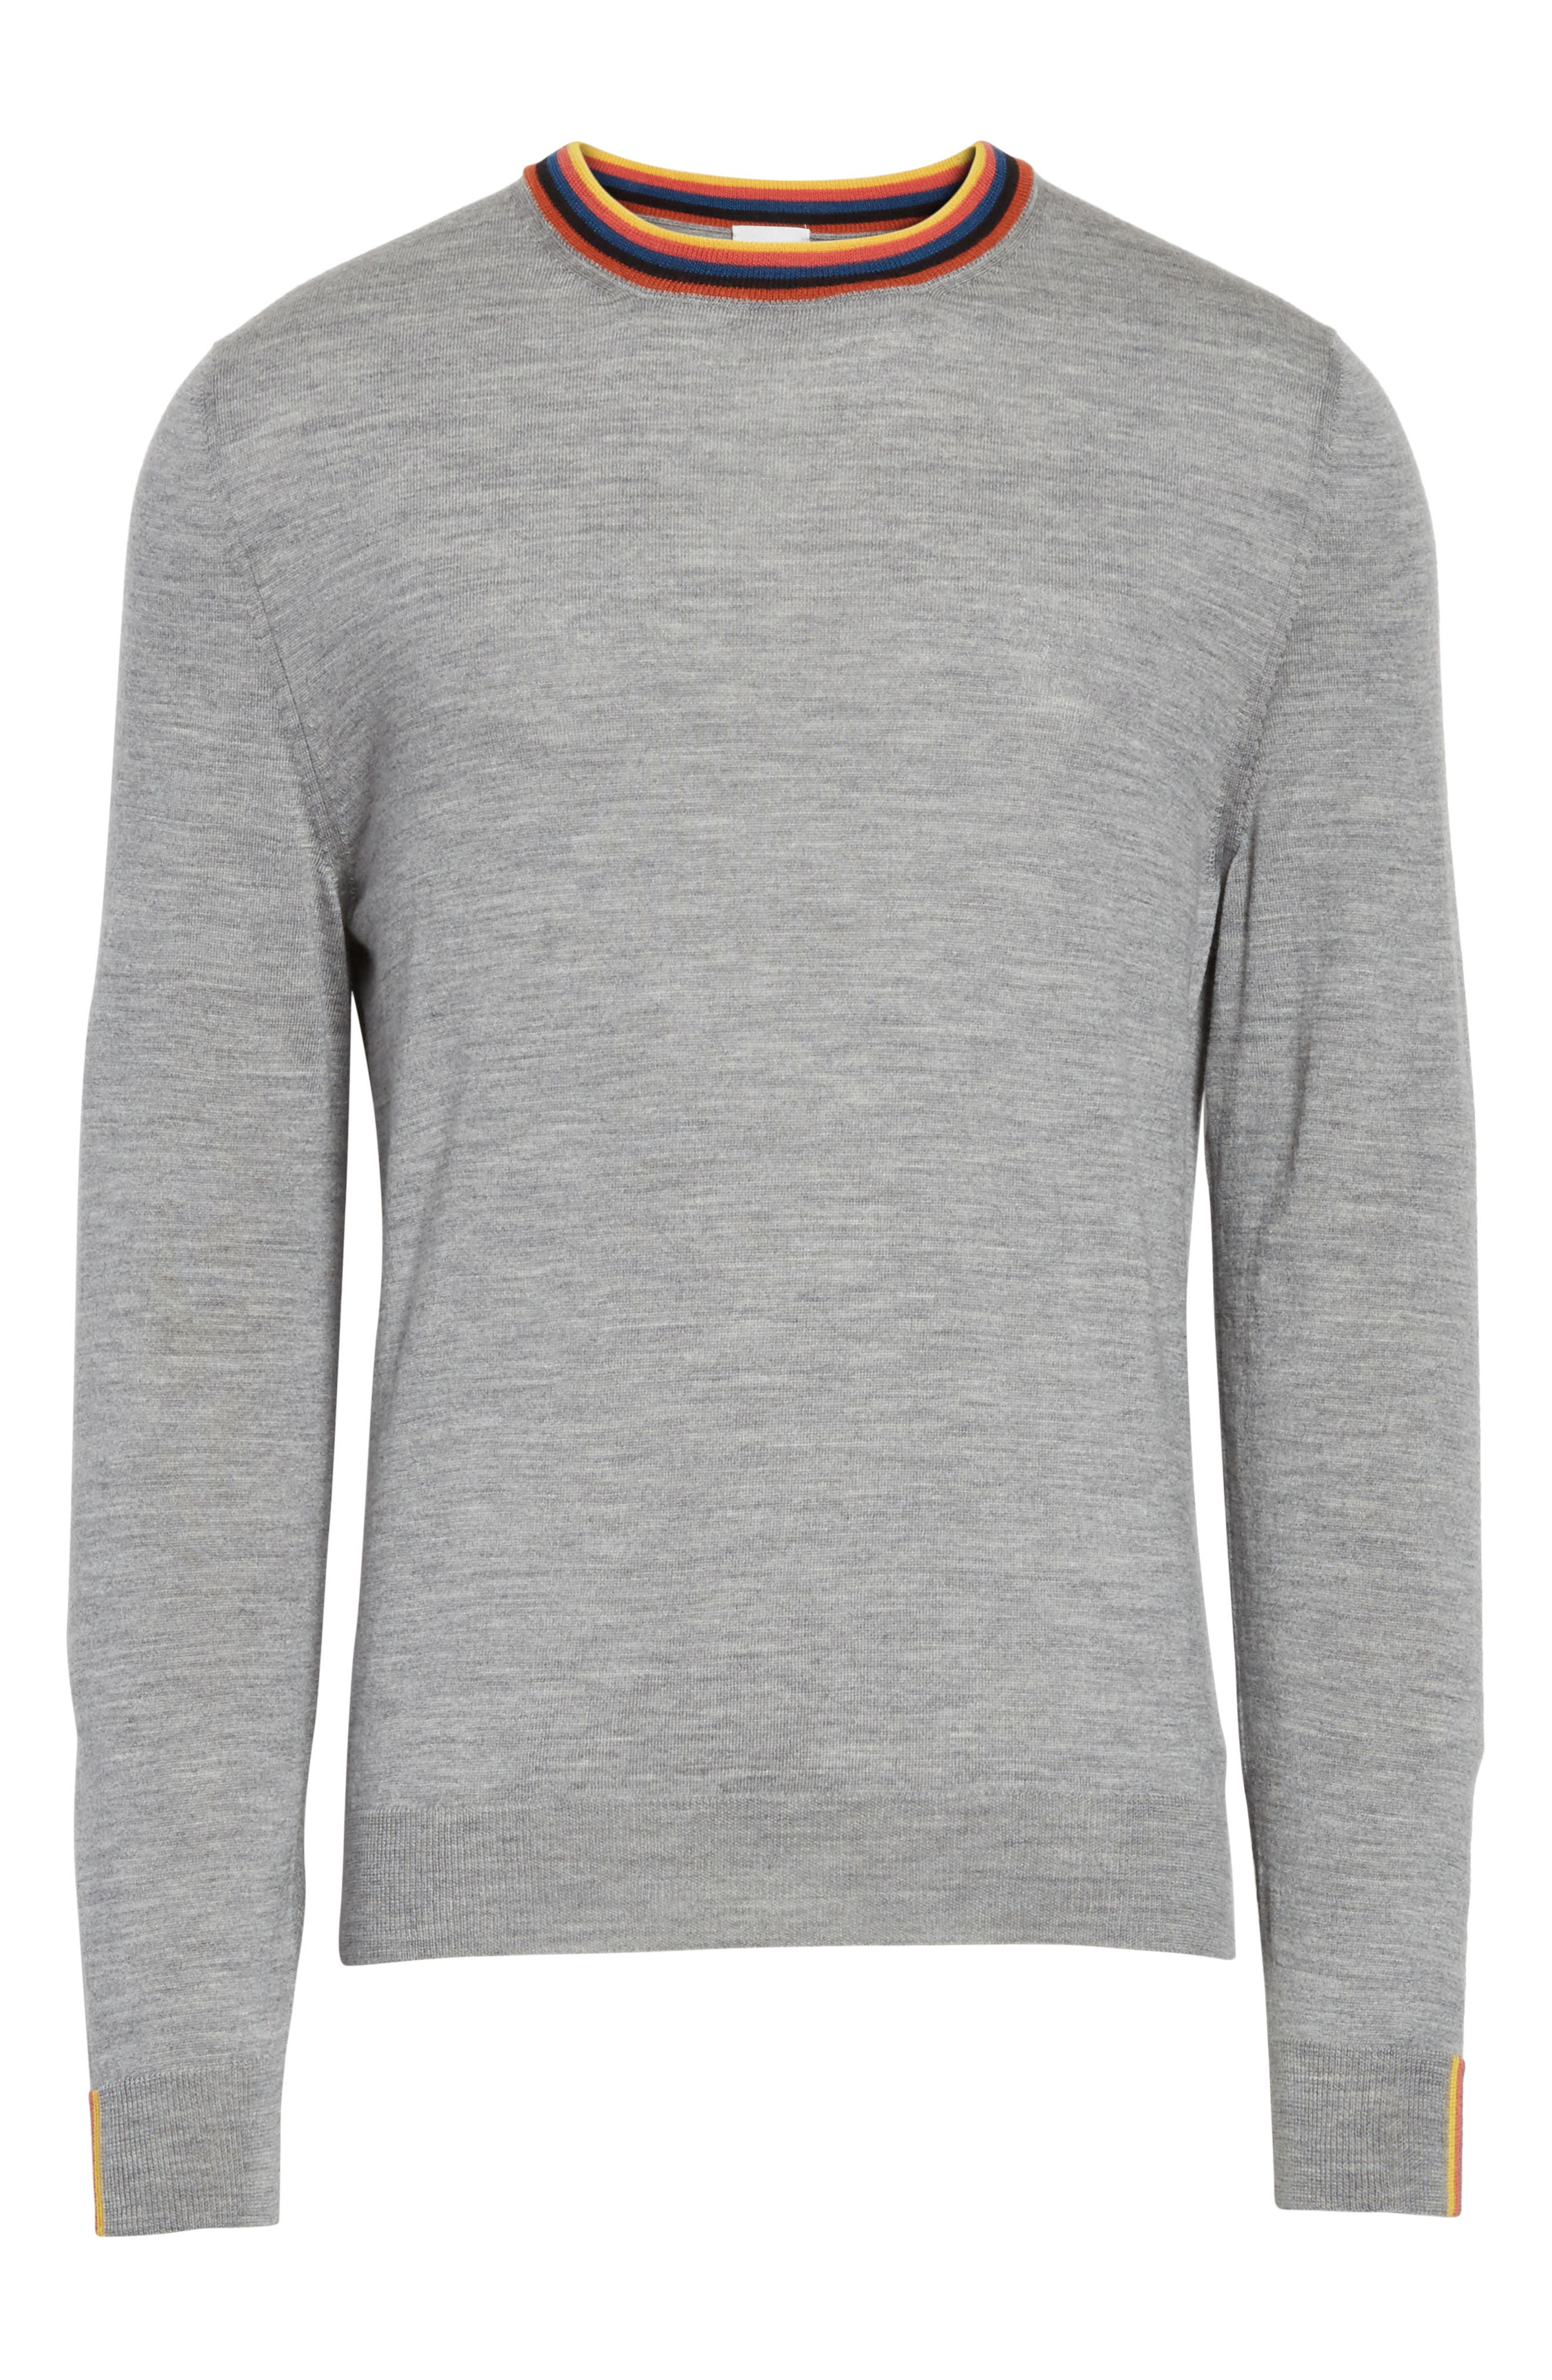 Artist Stripe Merino Wool Sweater,                             Alternate thumbnail 6, color,                             Grey